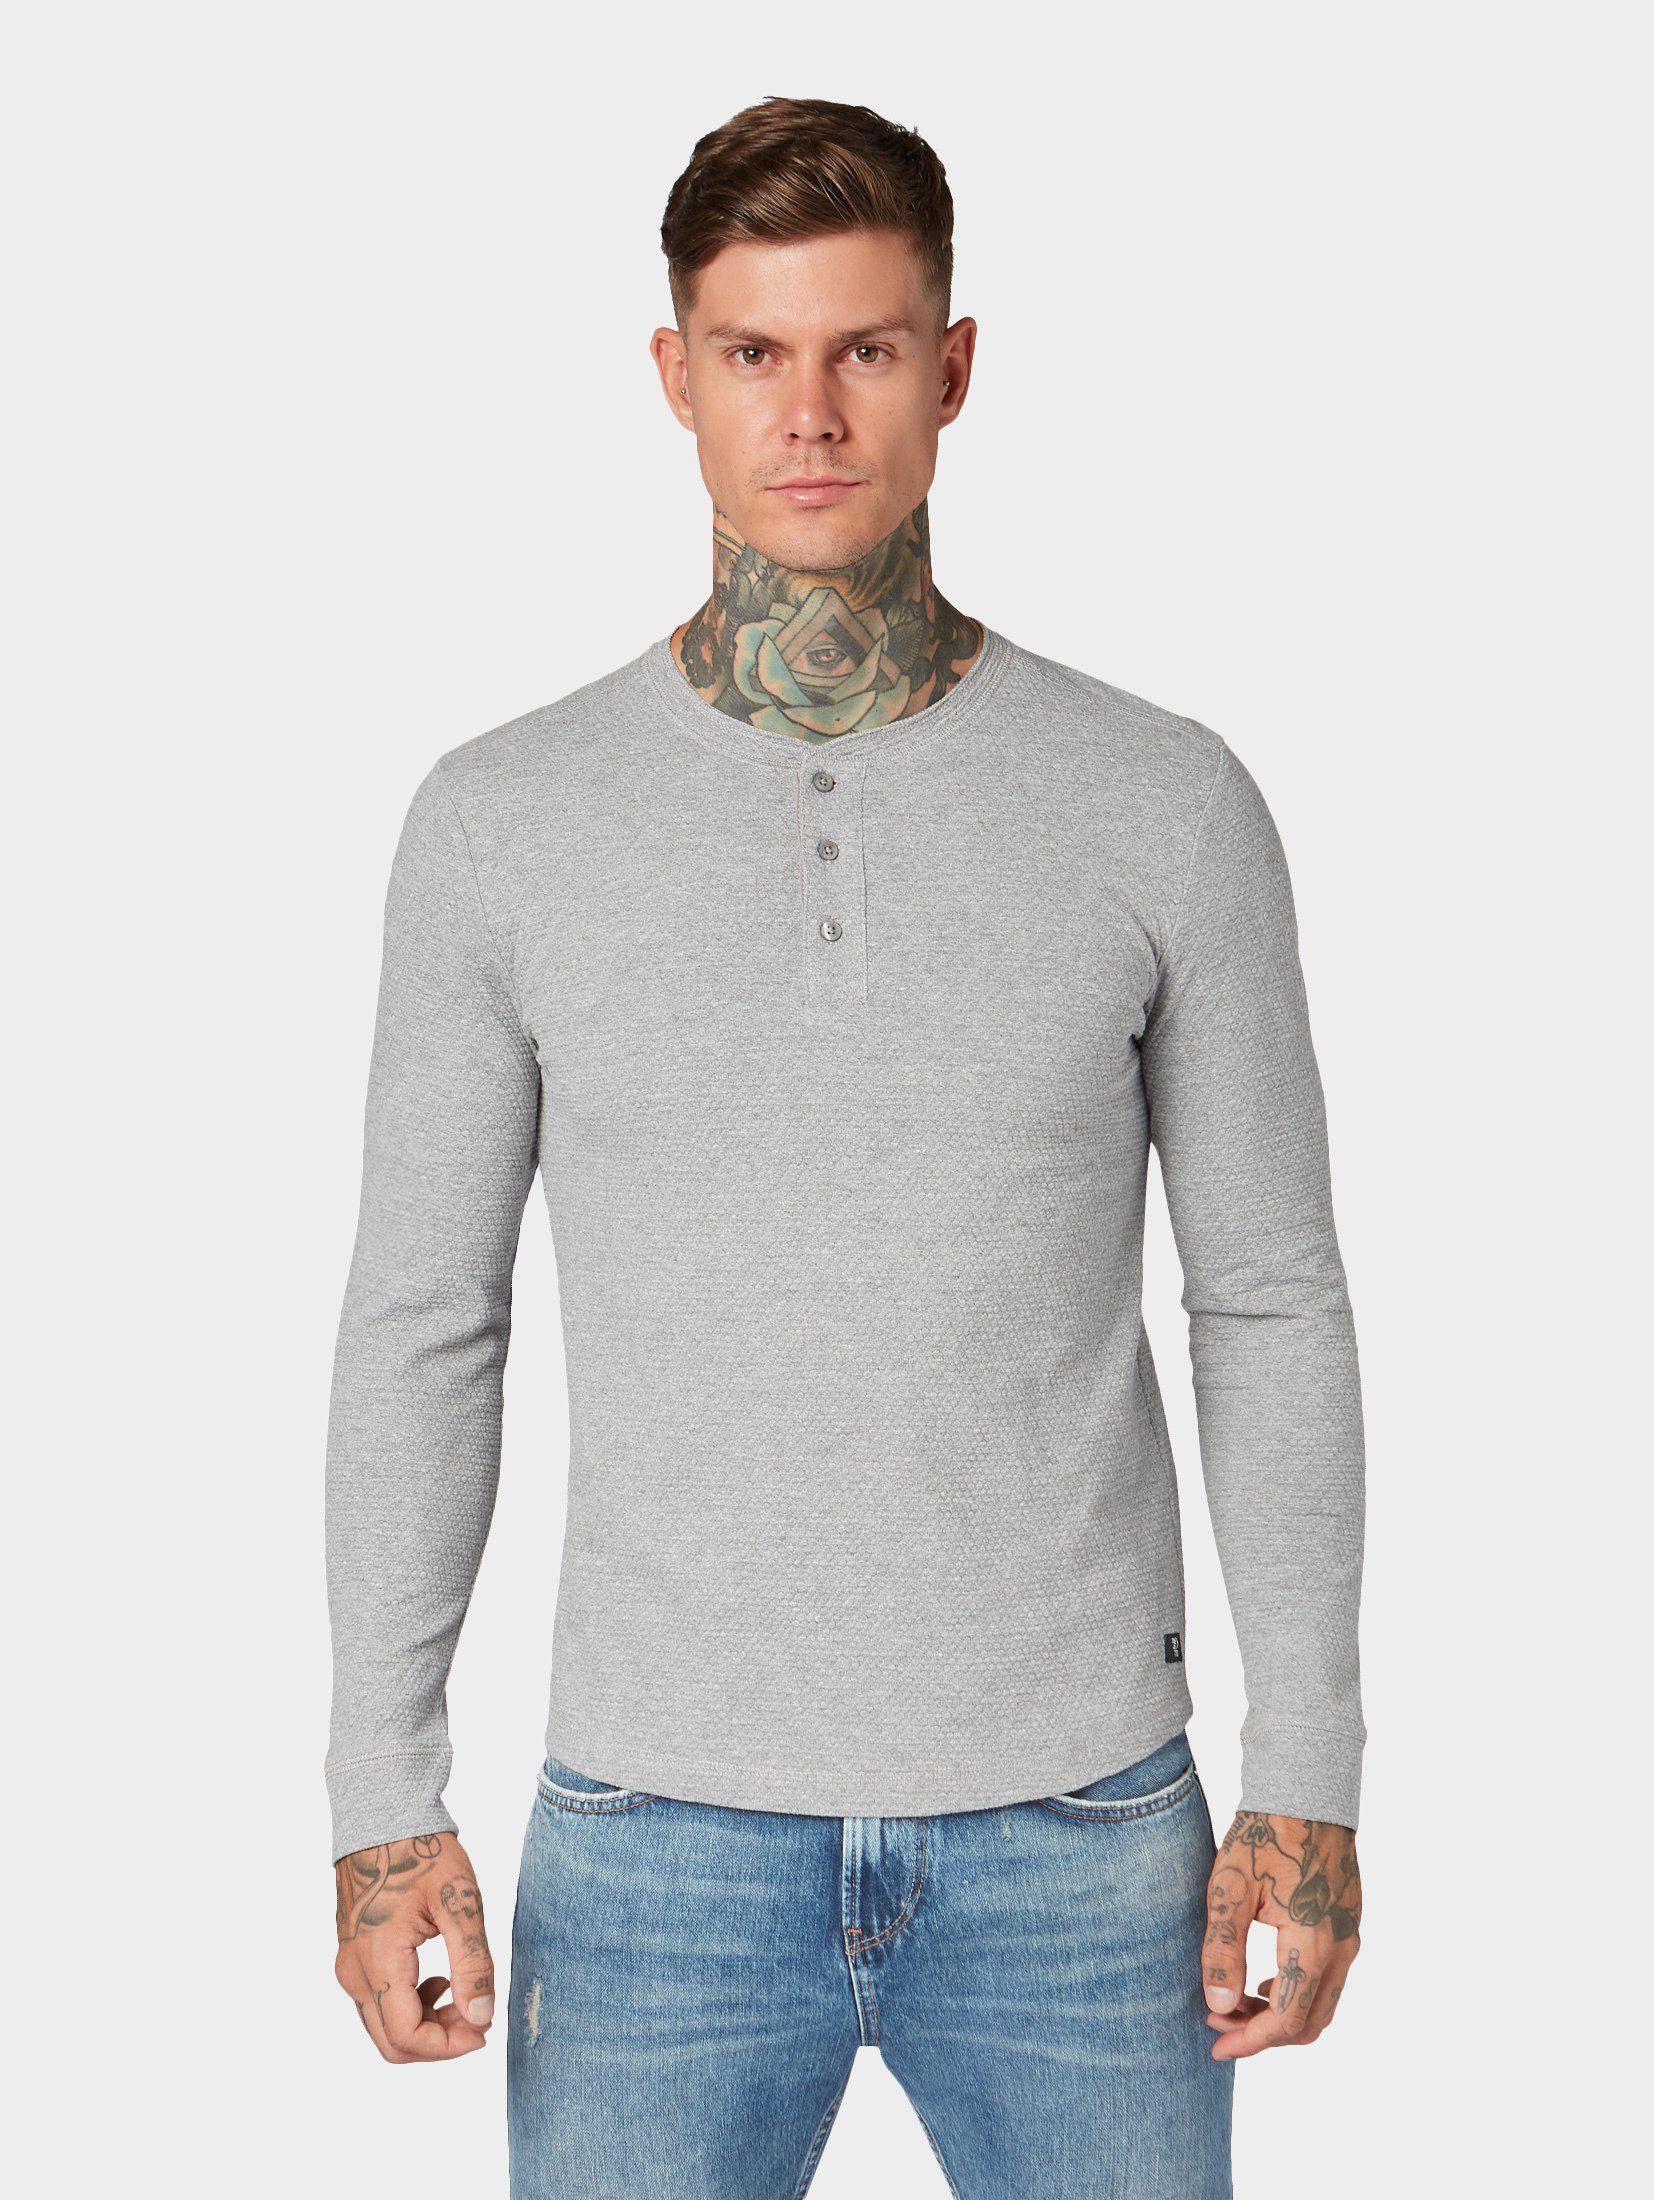 Herren TOM TAILOR Denim Langarmshirt »Henley-Shirt« blau, grau, grün | 04062362012950